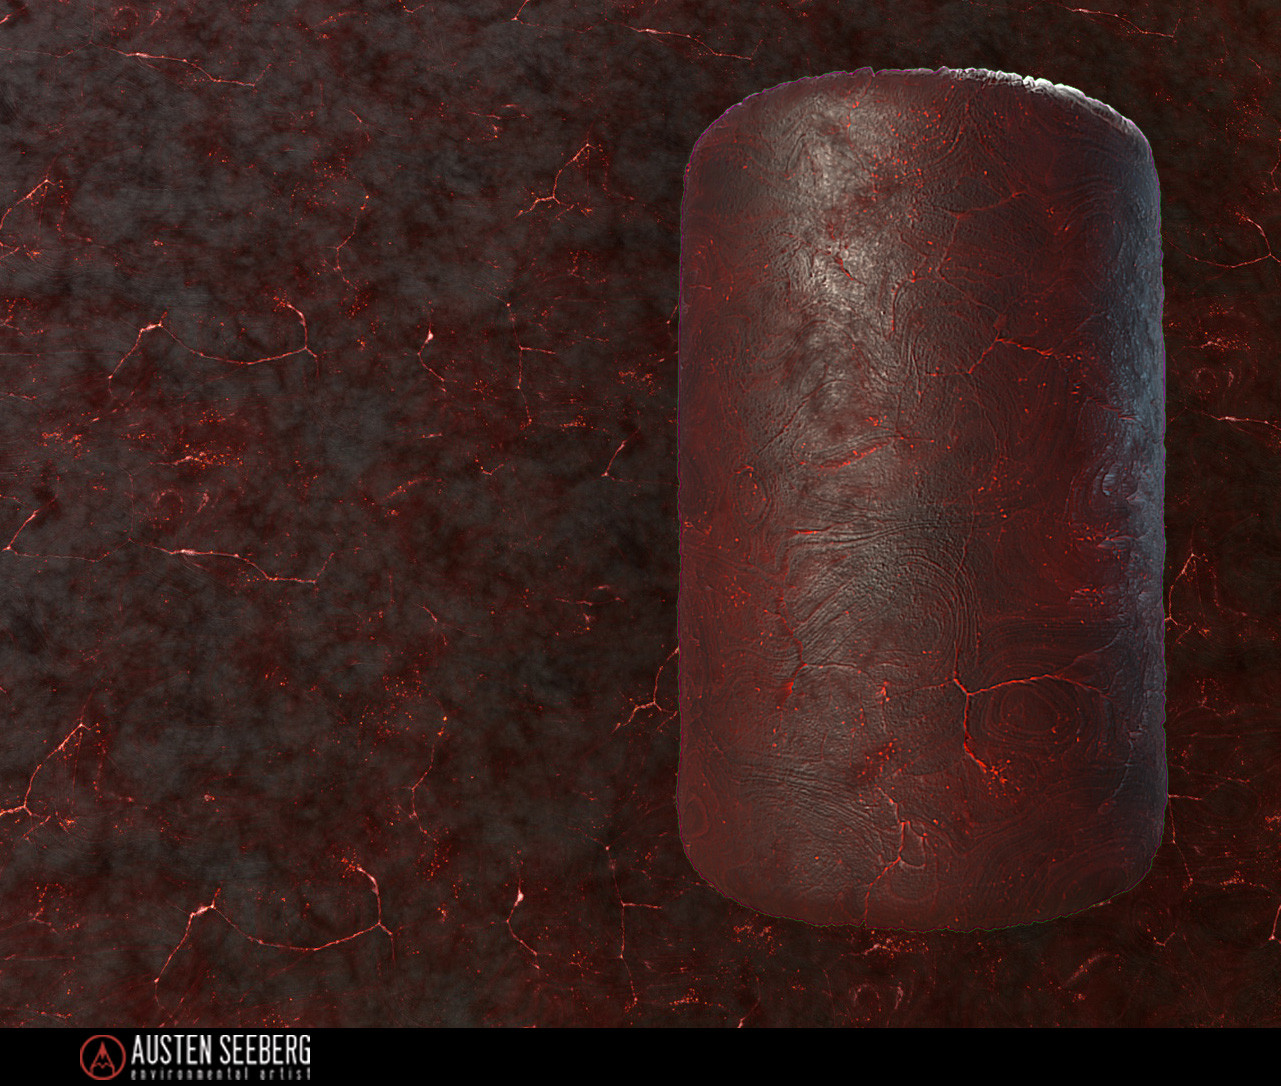 Austen seeberg coolcomp